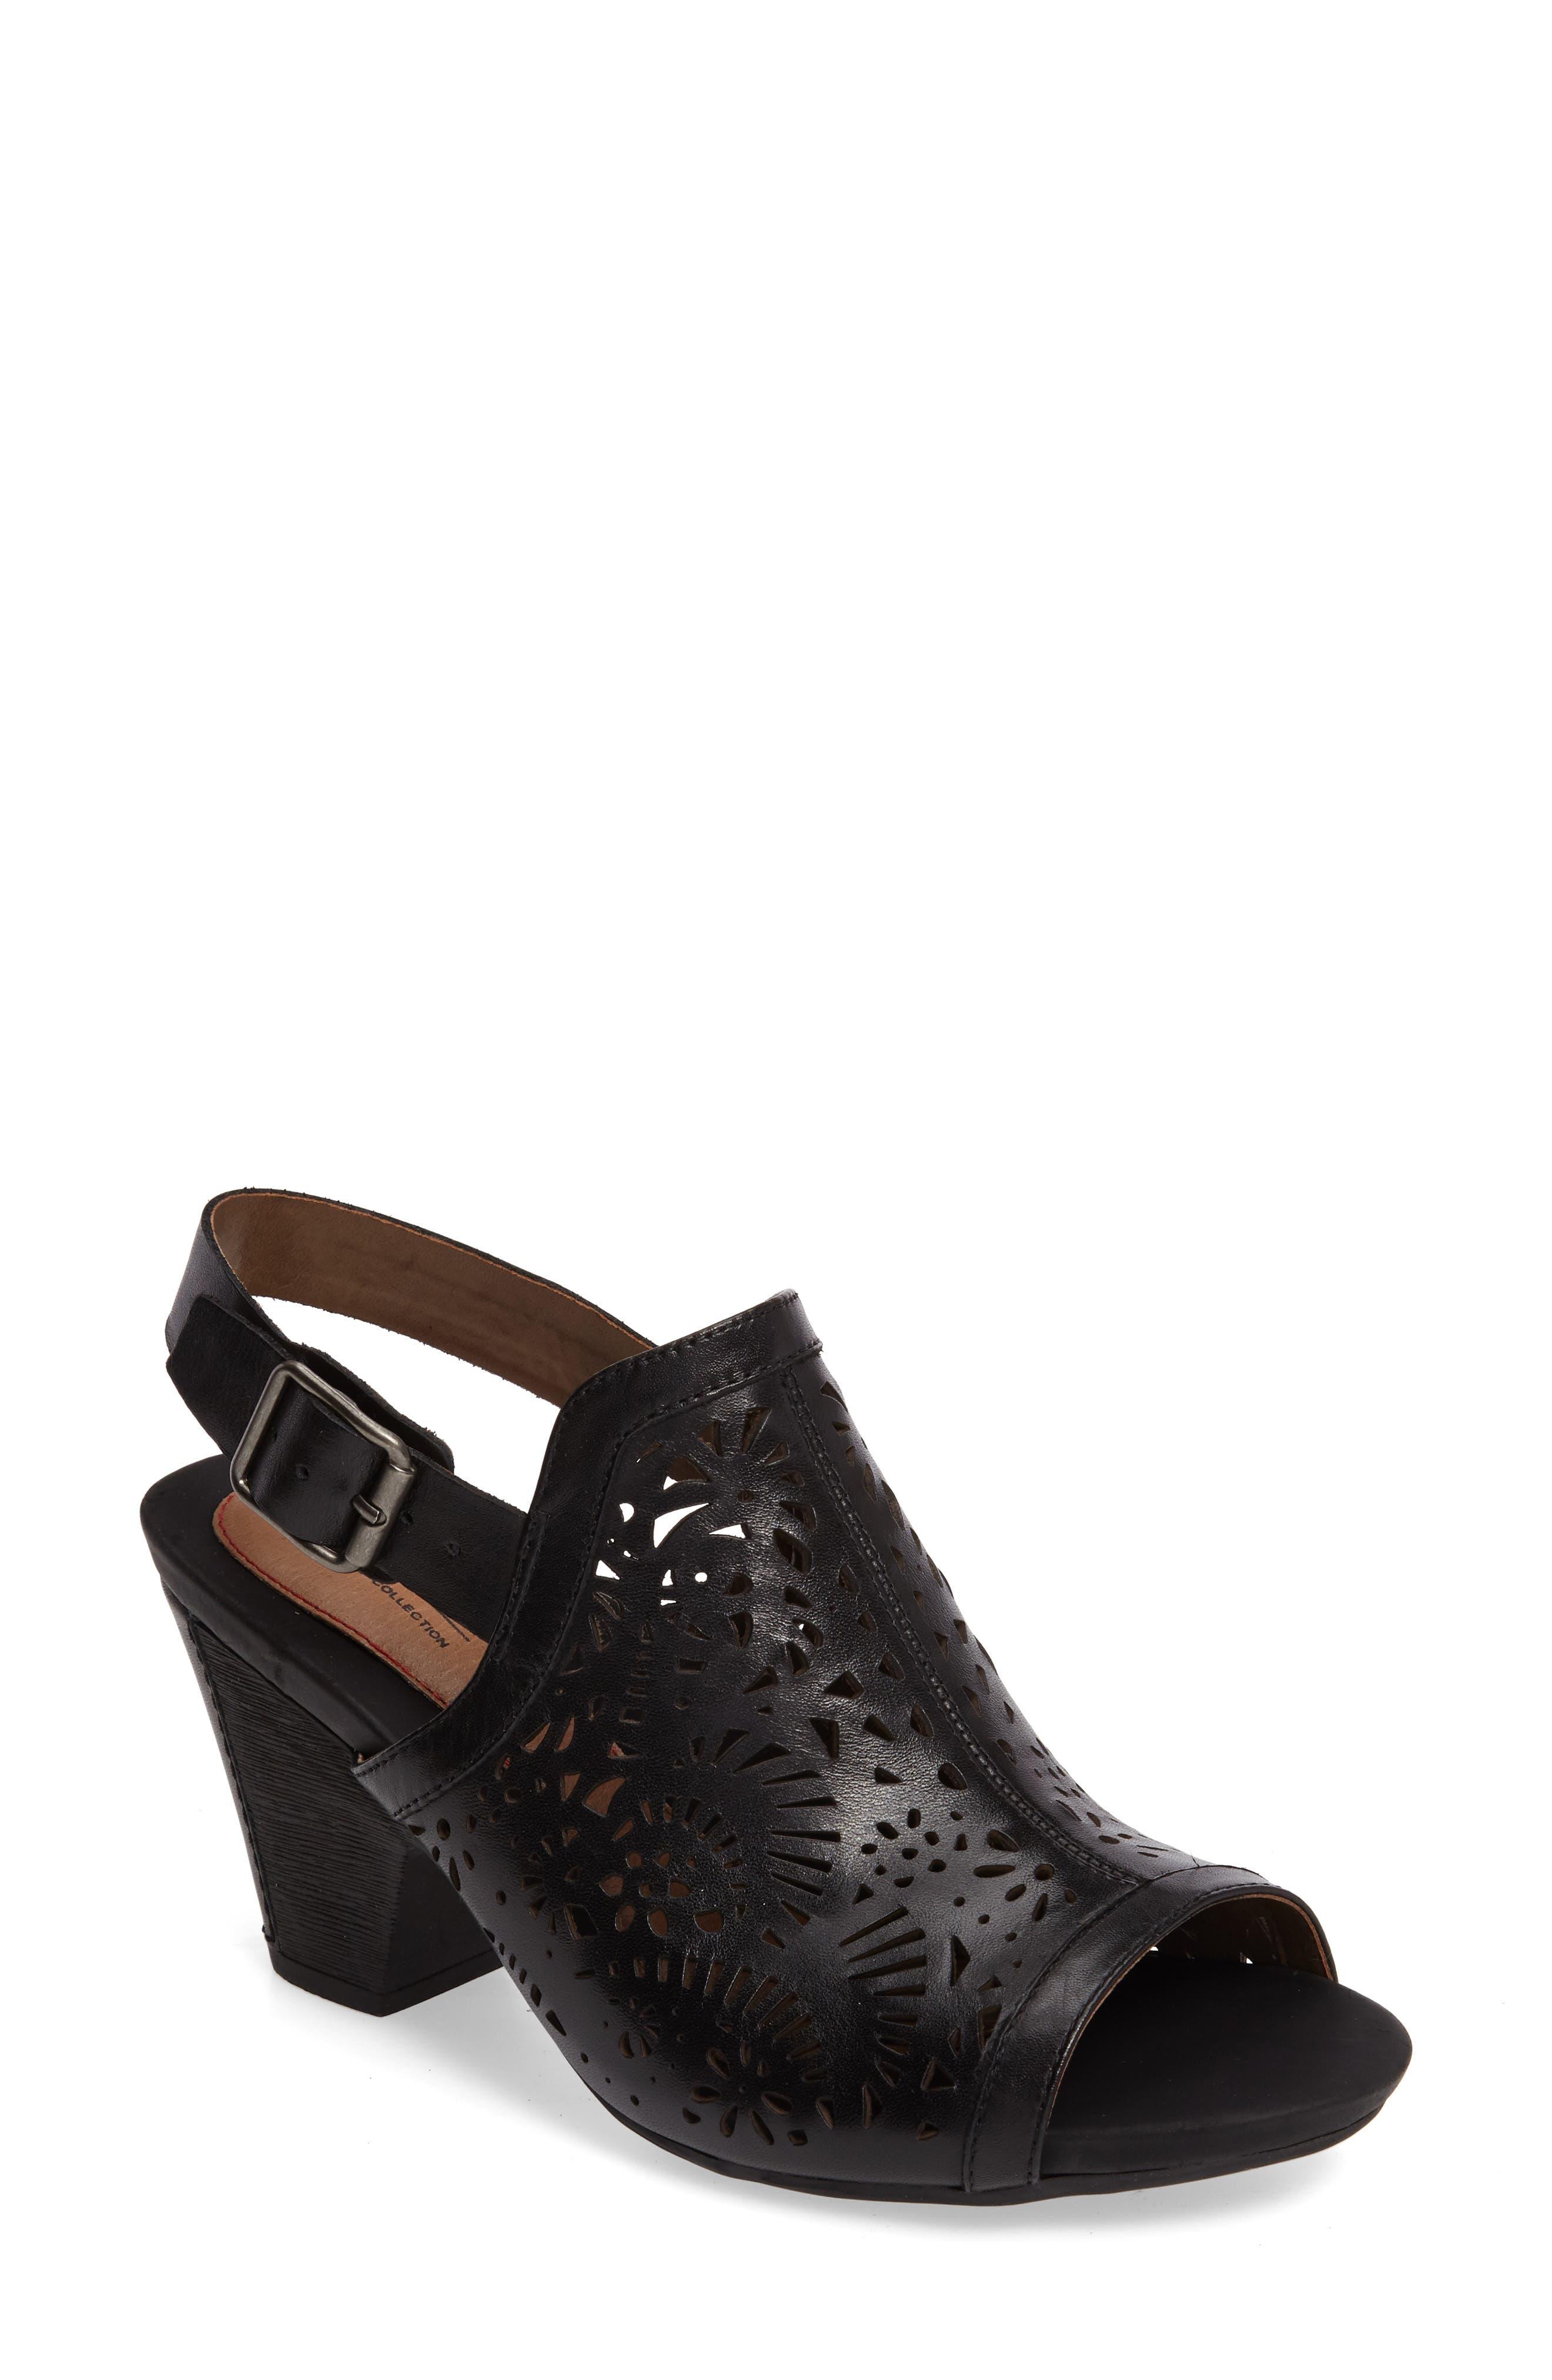 Tropez Block Heel Sandal,                             Main thumbnail 1, color,